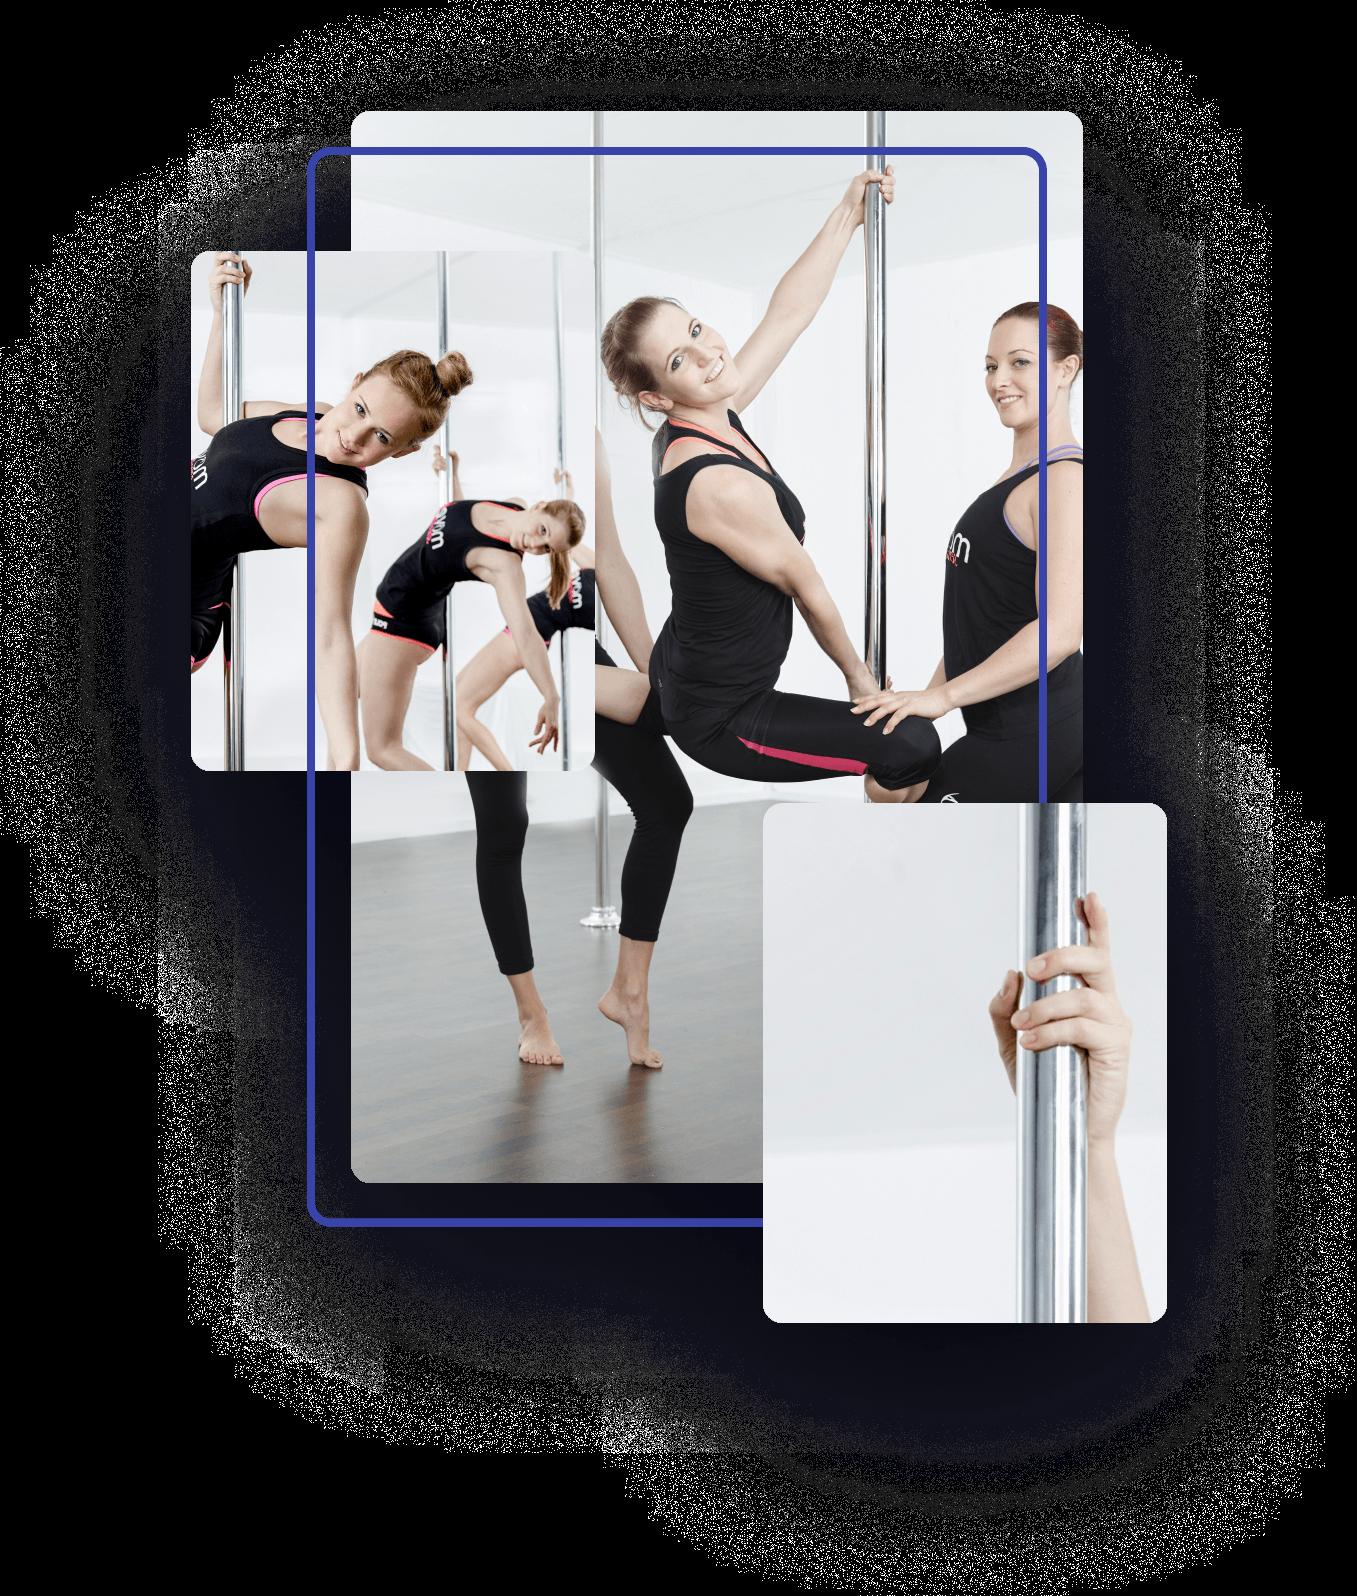 pole-dance0-test@2x.png